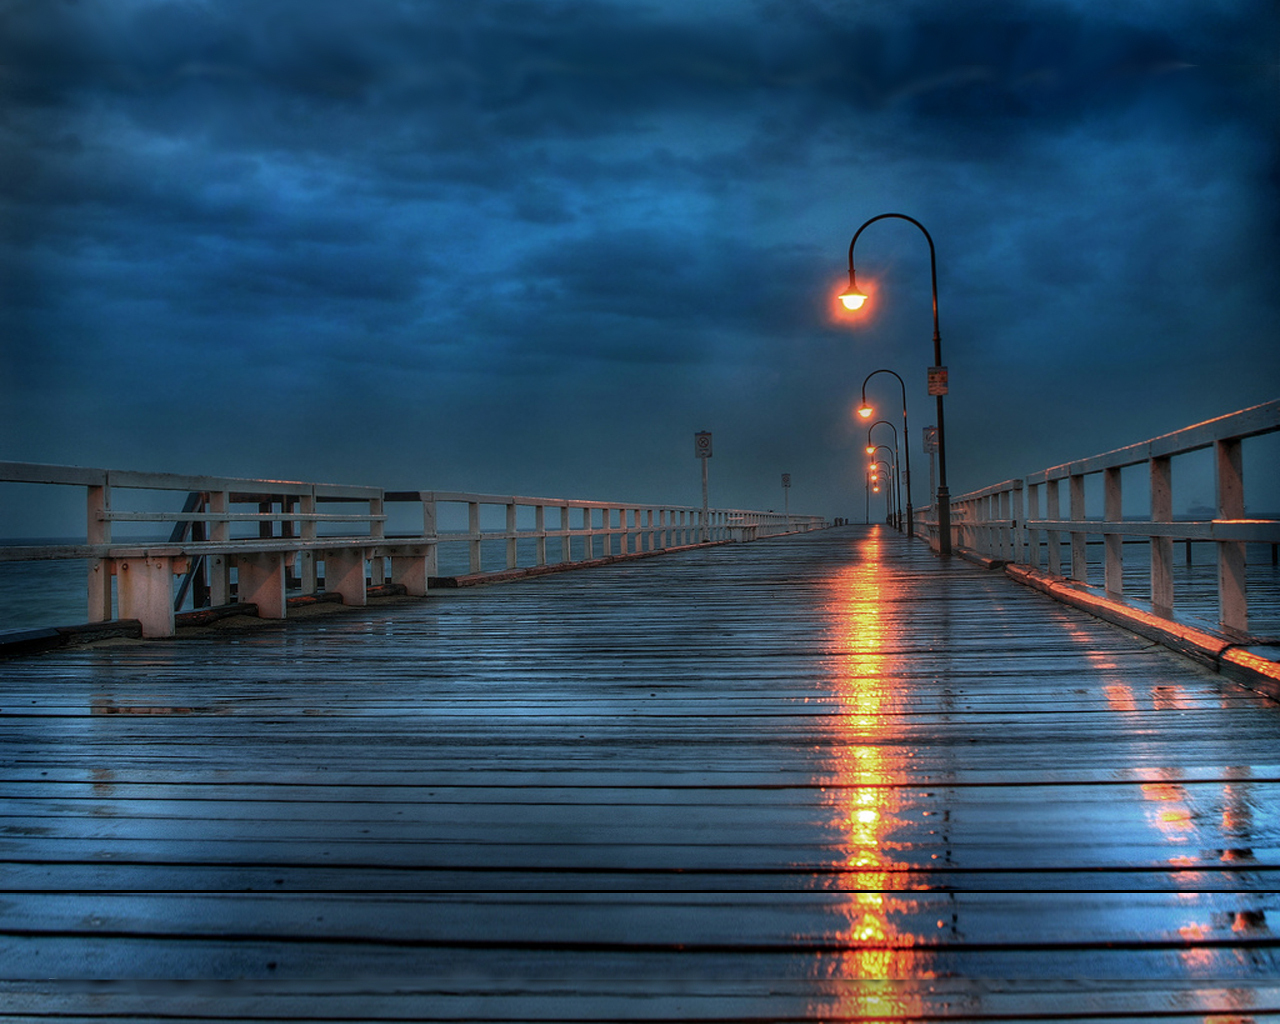 rainy deck   Beautiful Places Wallpaper 13747509 1280x1024